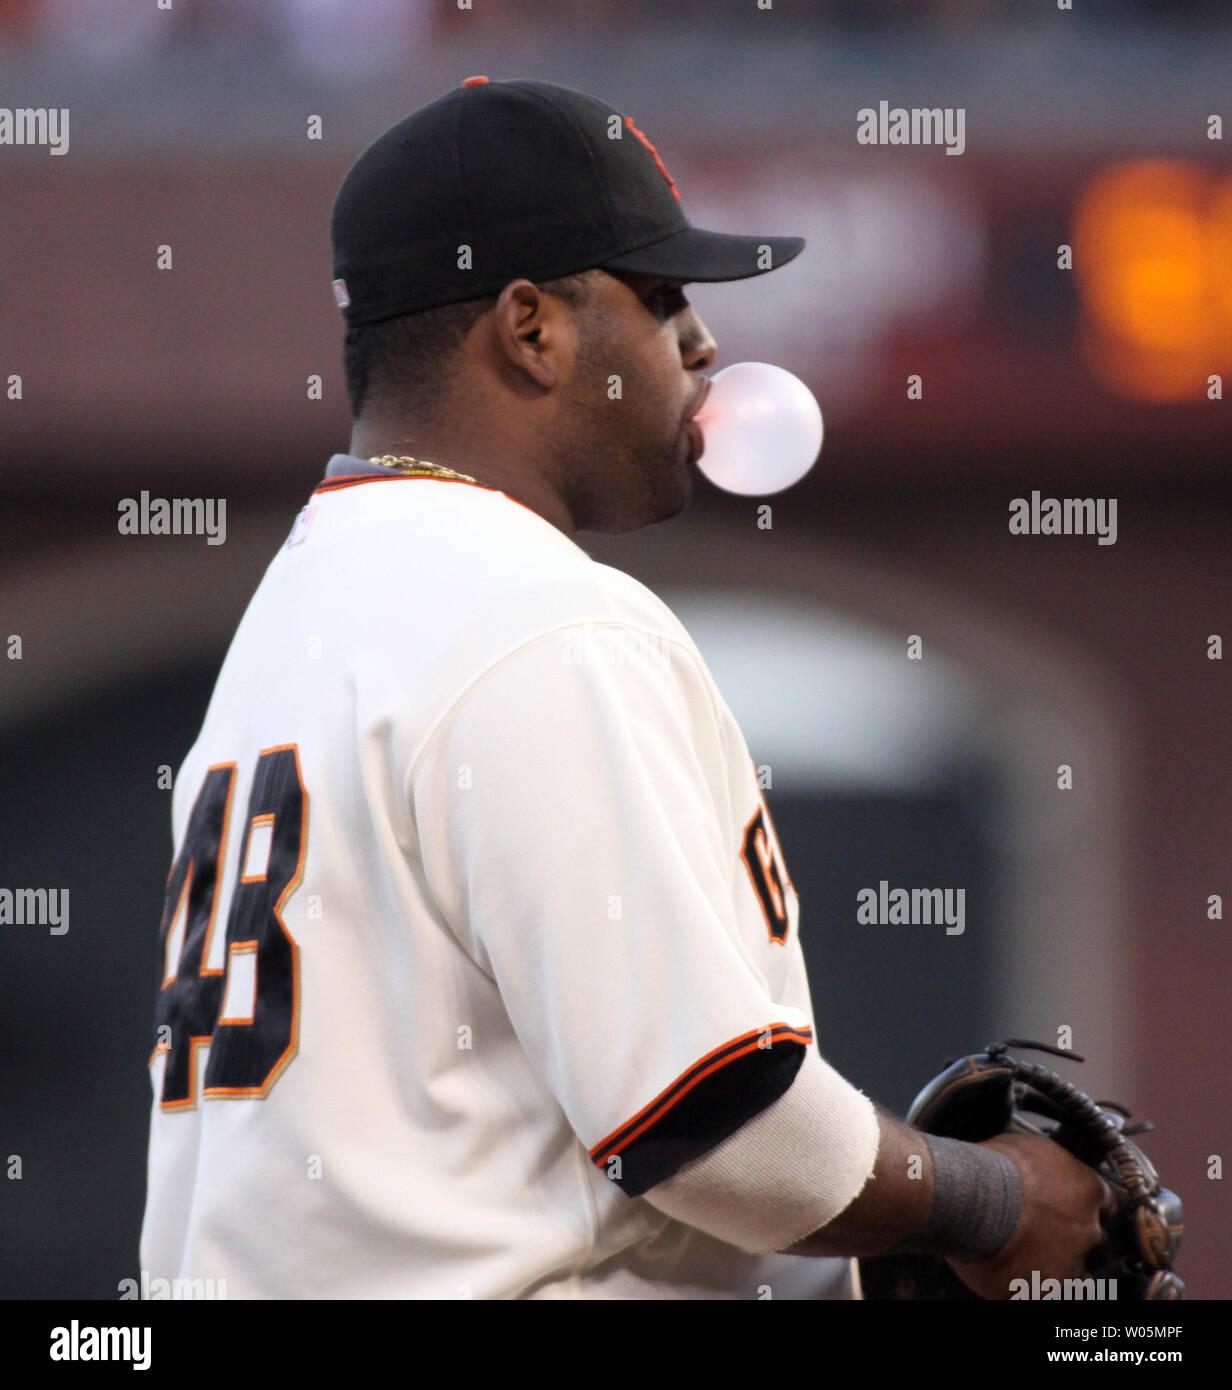 San Francisco Giants Pablo Sandoval blows a bubble during